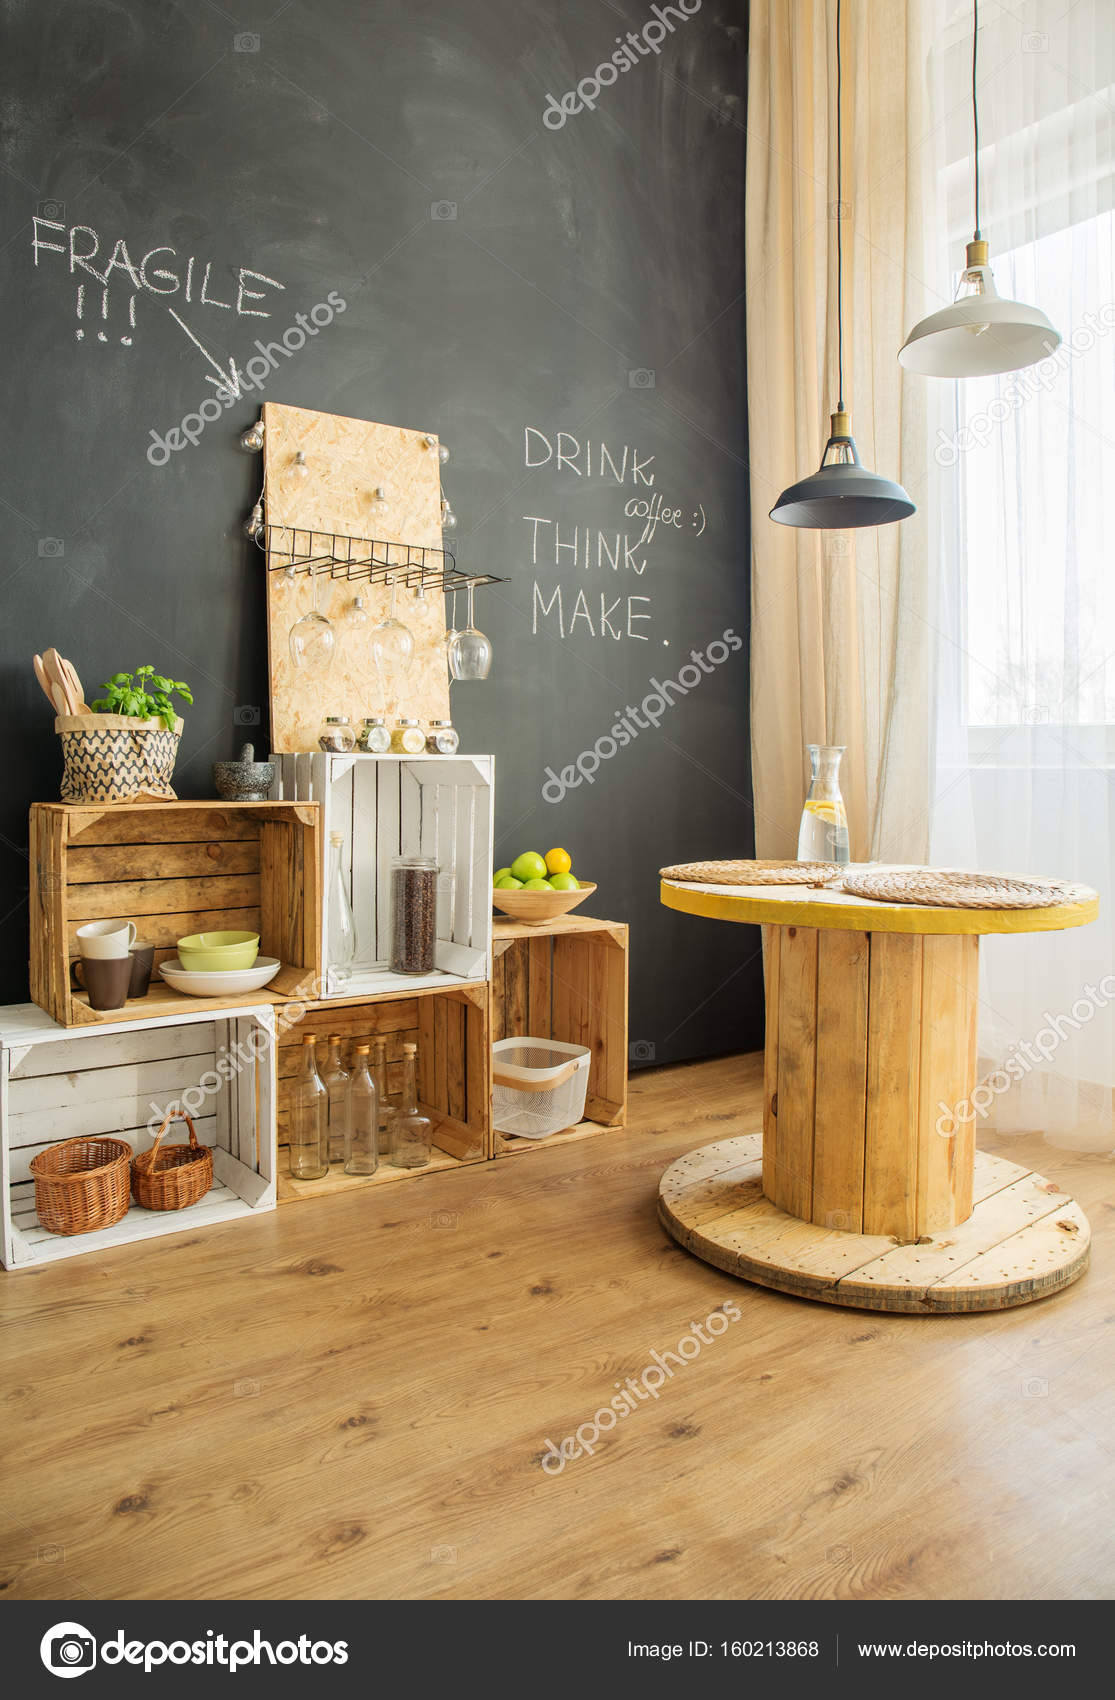 diy m bel aus kisten und kabel hocker stockfoto 160213868. Black Bedroom Furniture Sets. Home Design Ideas